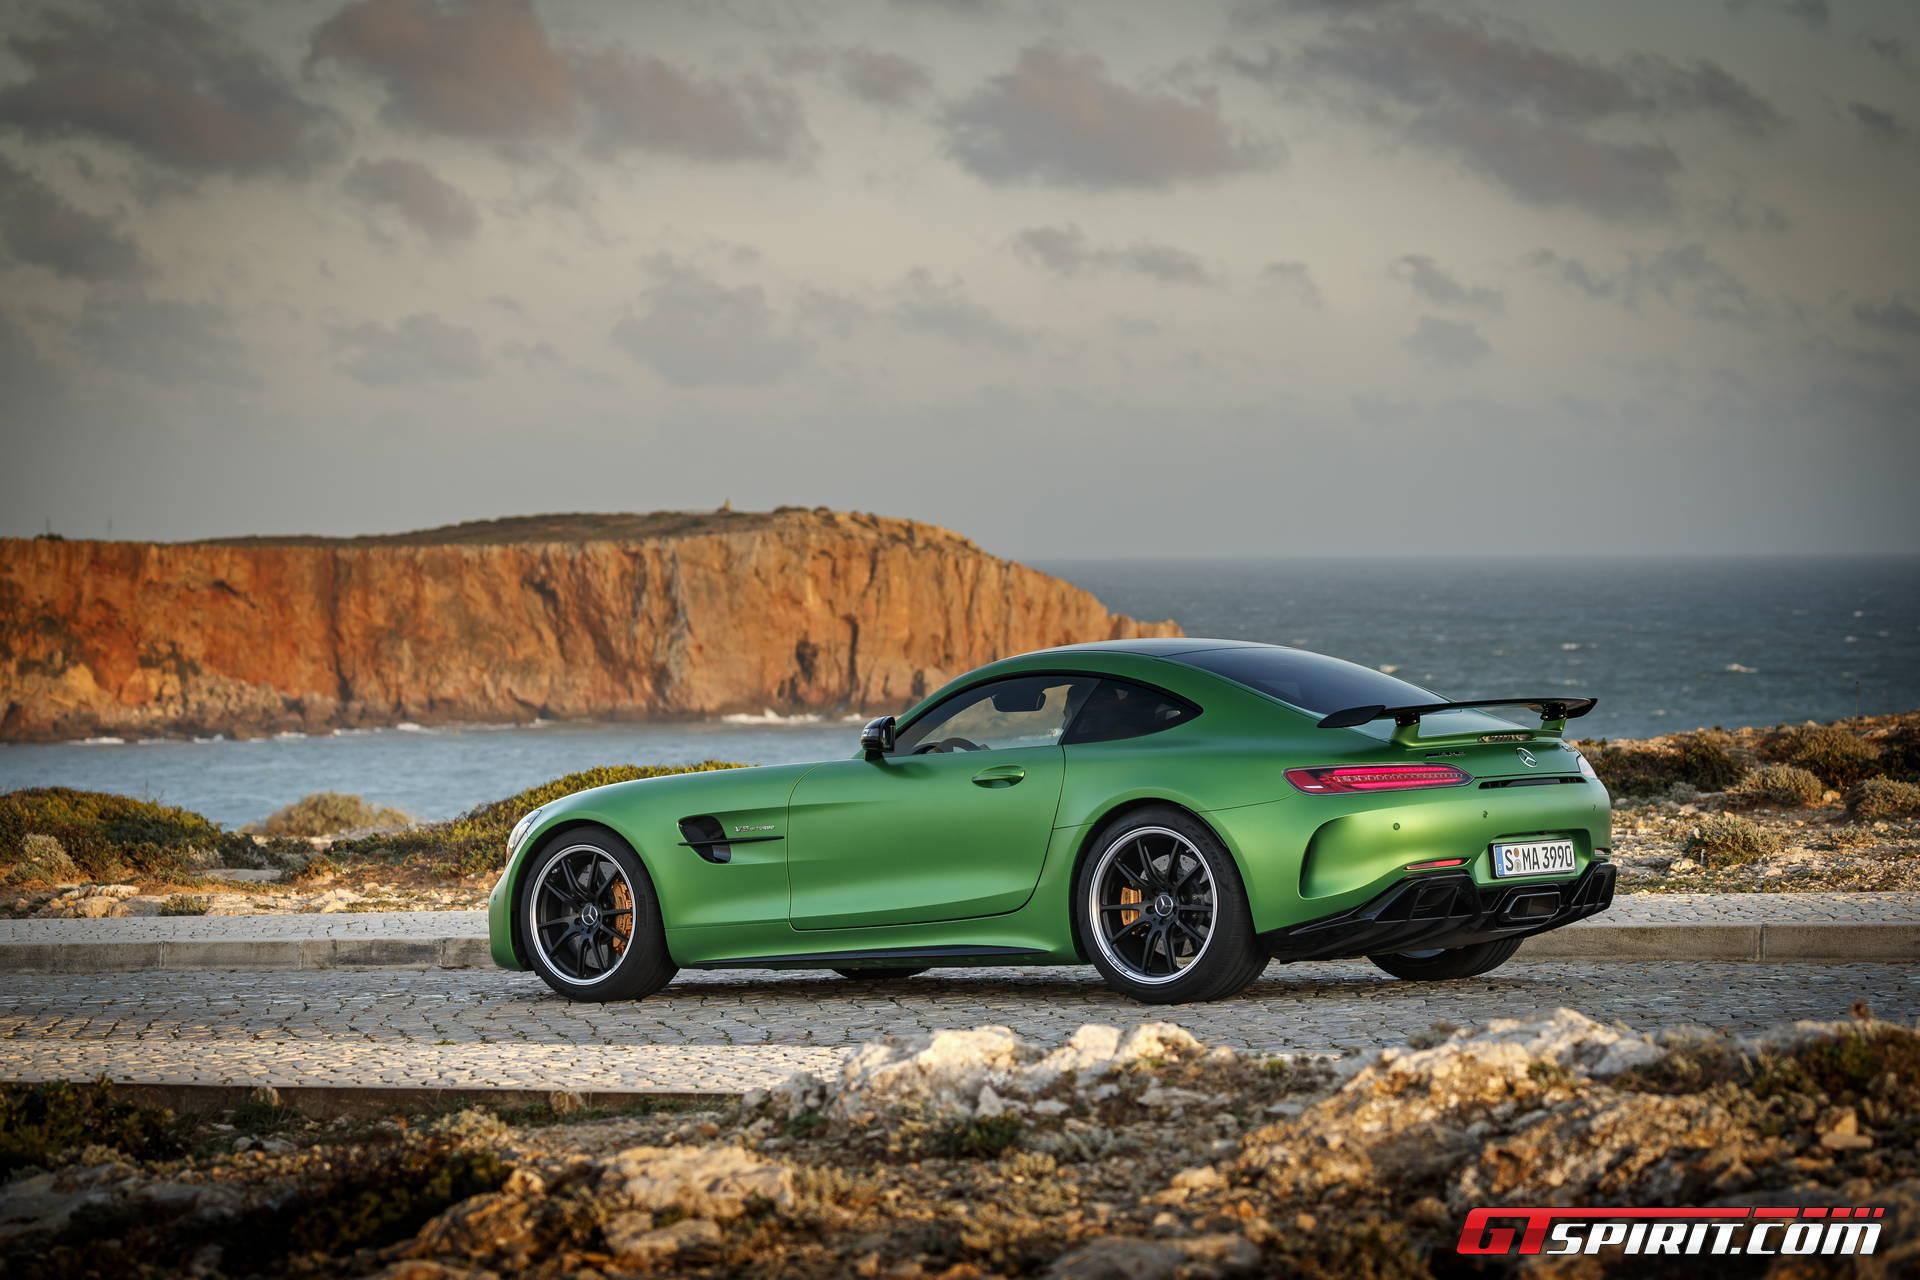 Mercedes amg gt r review gtspirit for Mercedes benz gtr amg 2017 price